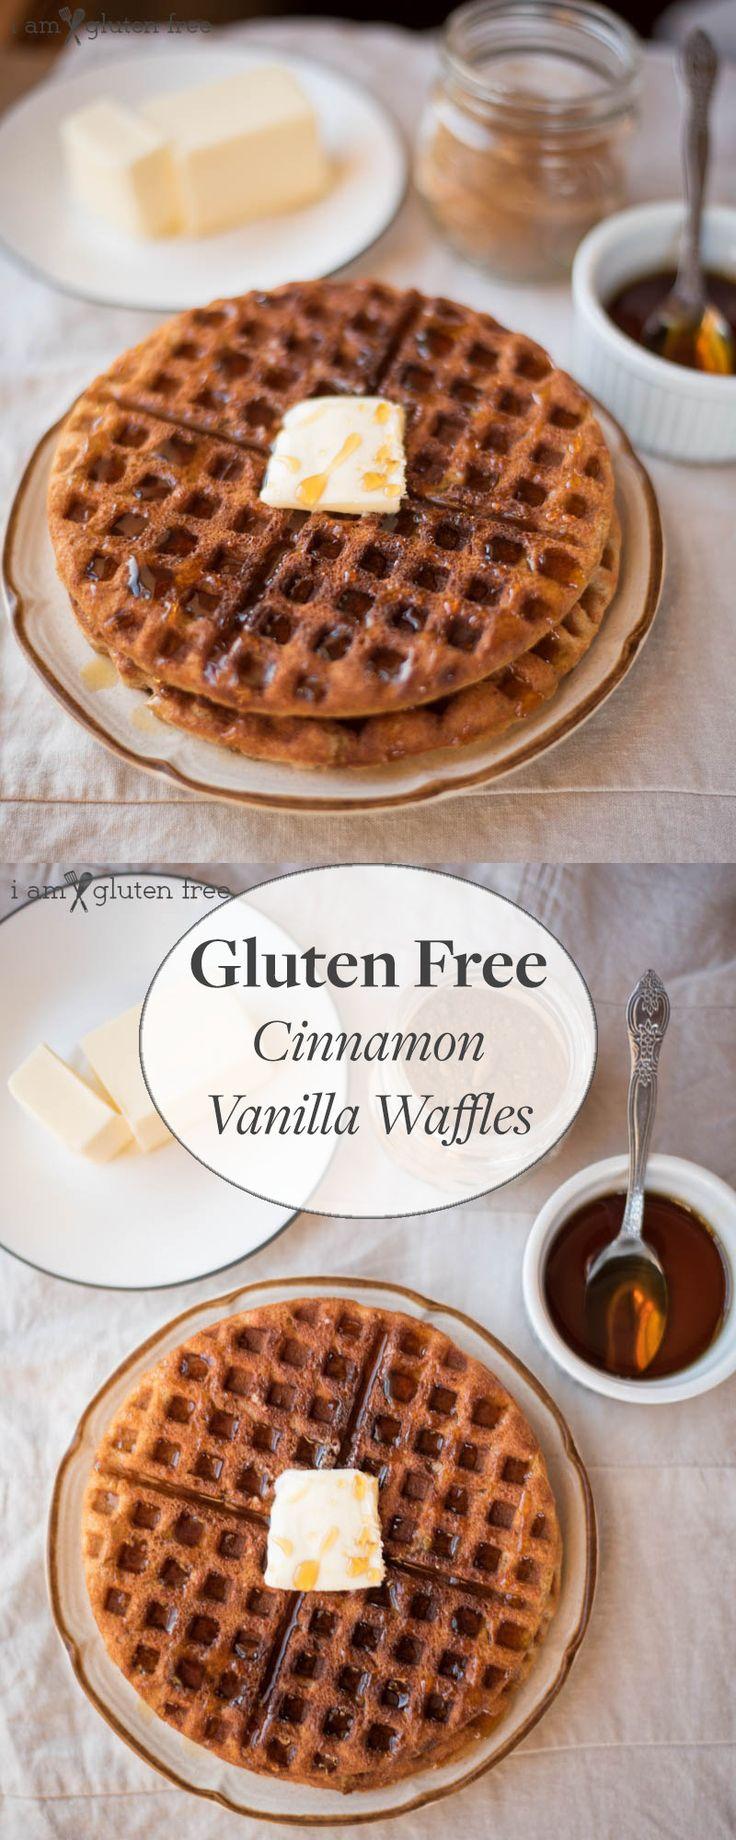 Pinterest: ➳ ℳissCourɬneyℳąe☼↟☾Cinnamon Vanilla Waffles